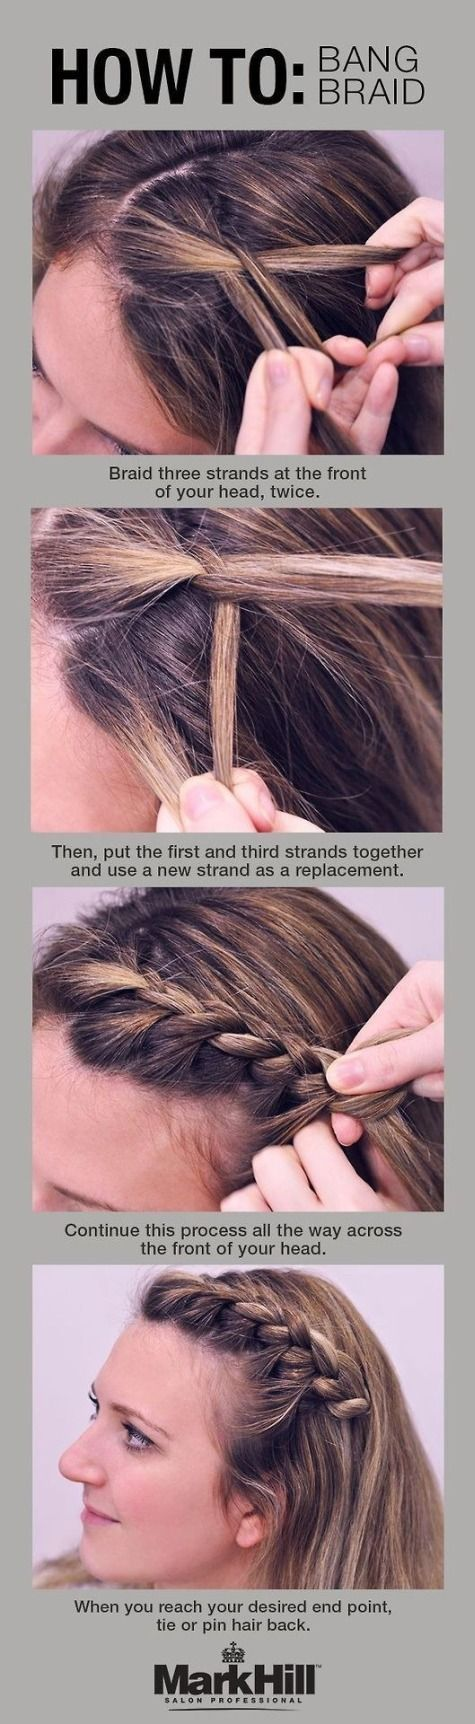 how-to-bang-braid via